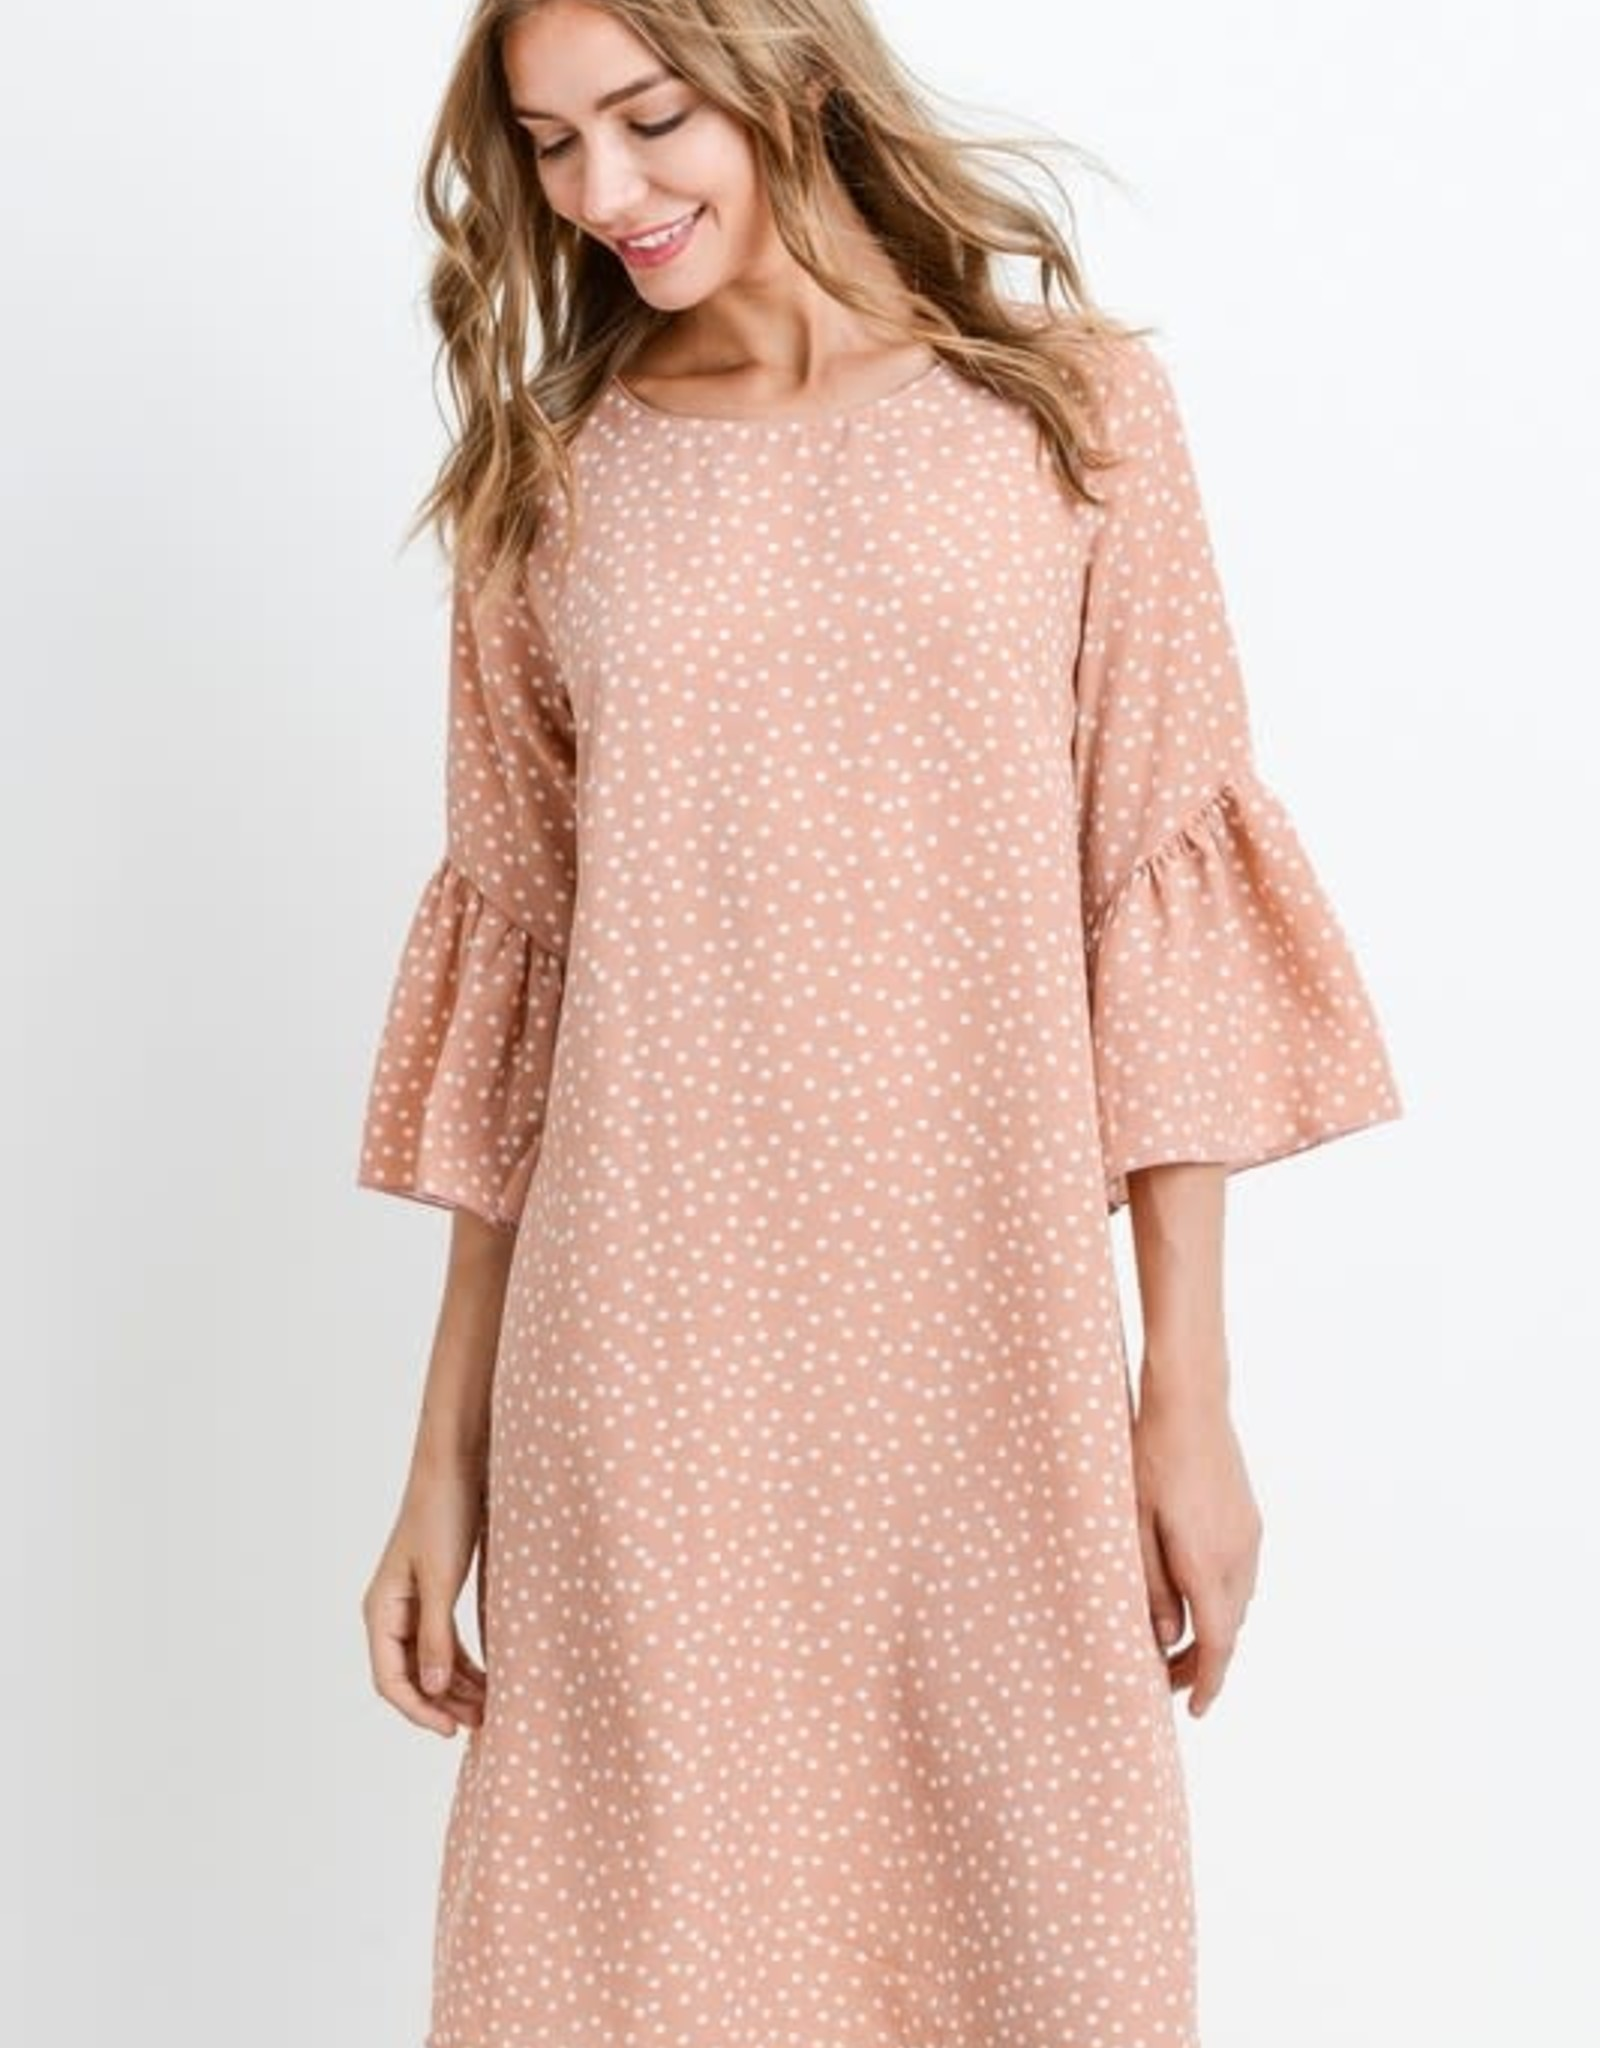 Polka Dot R.Sleeve Dress